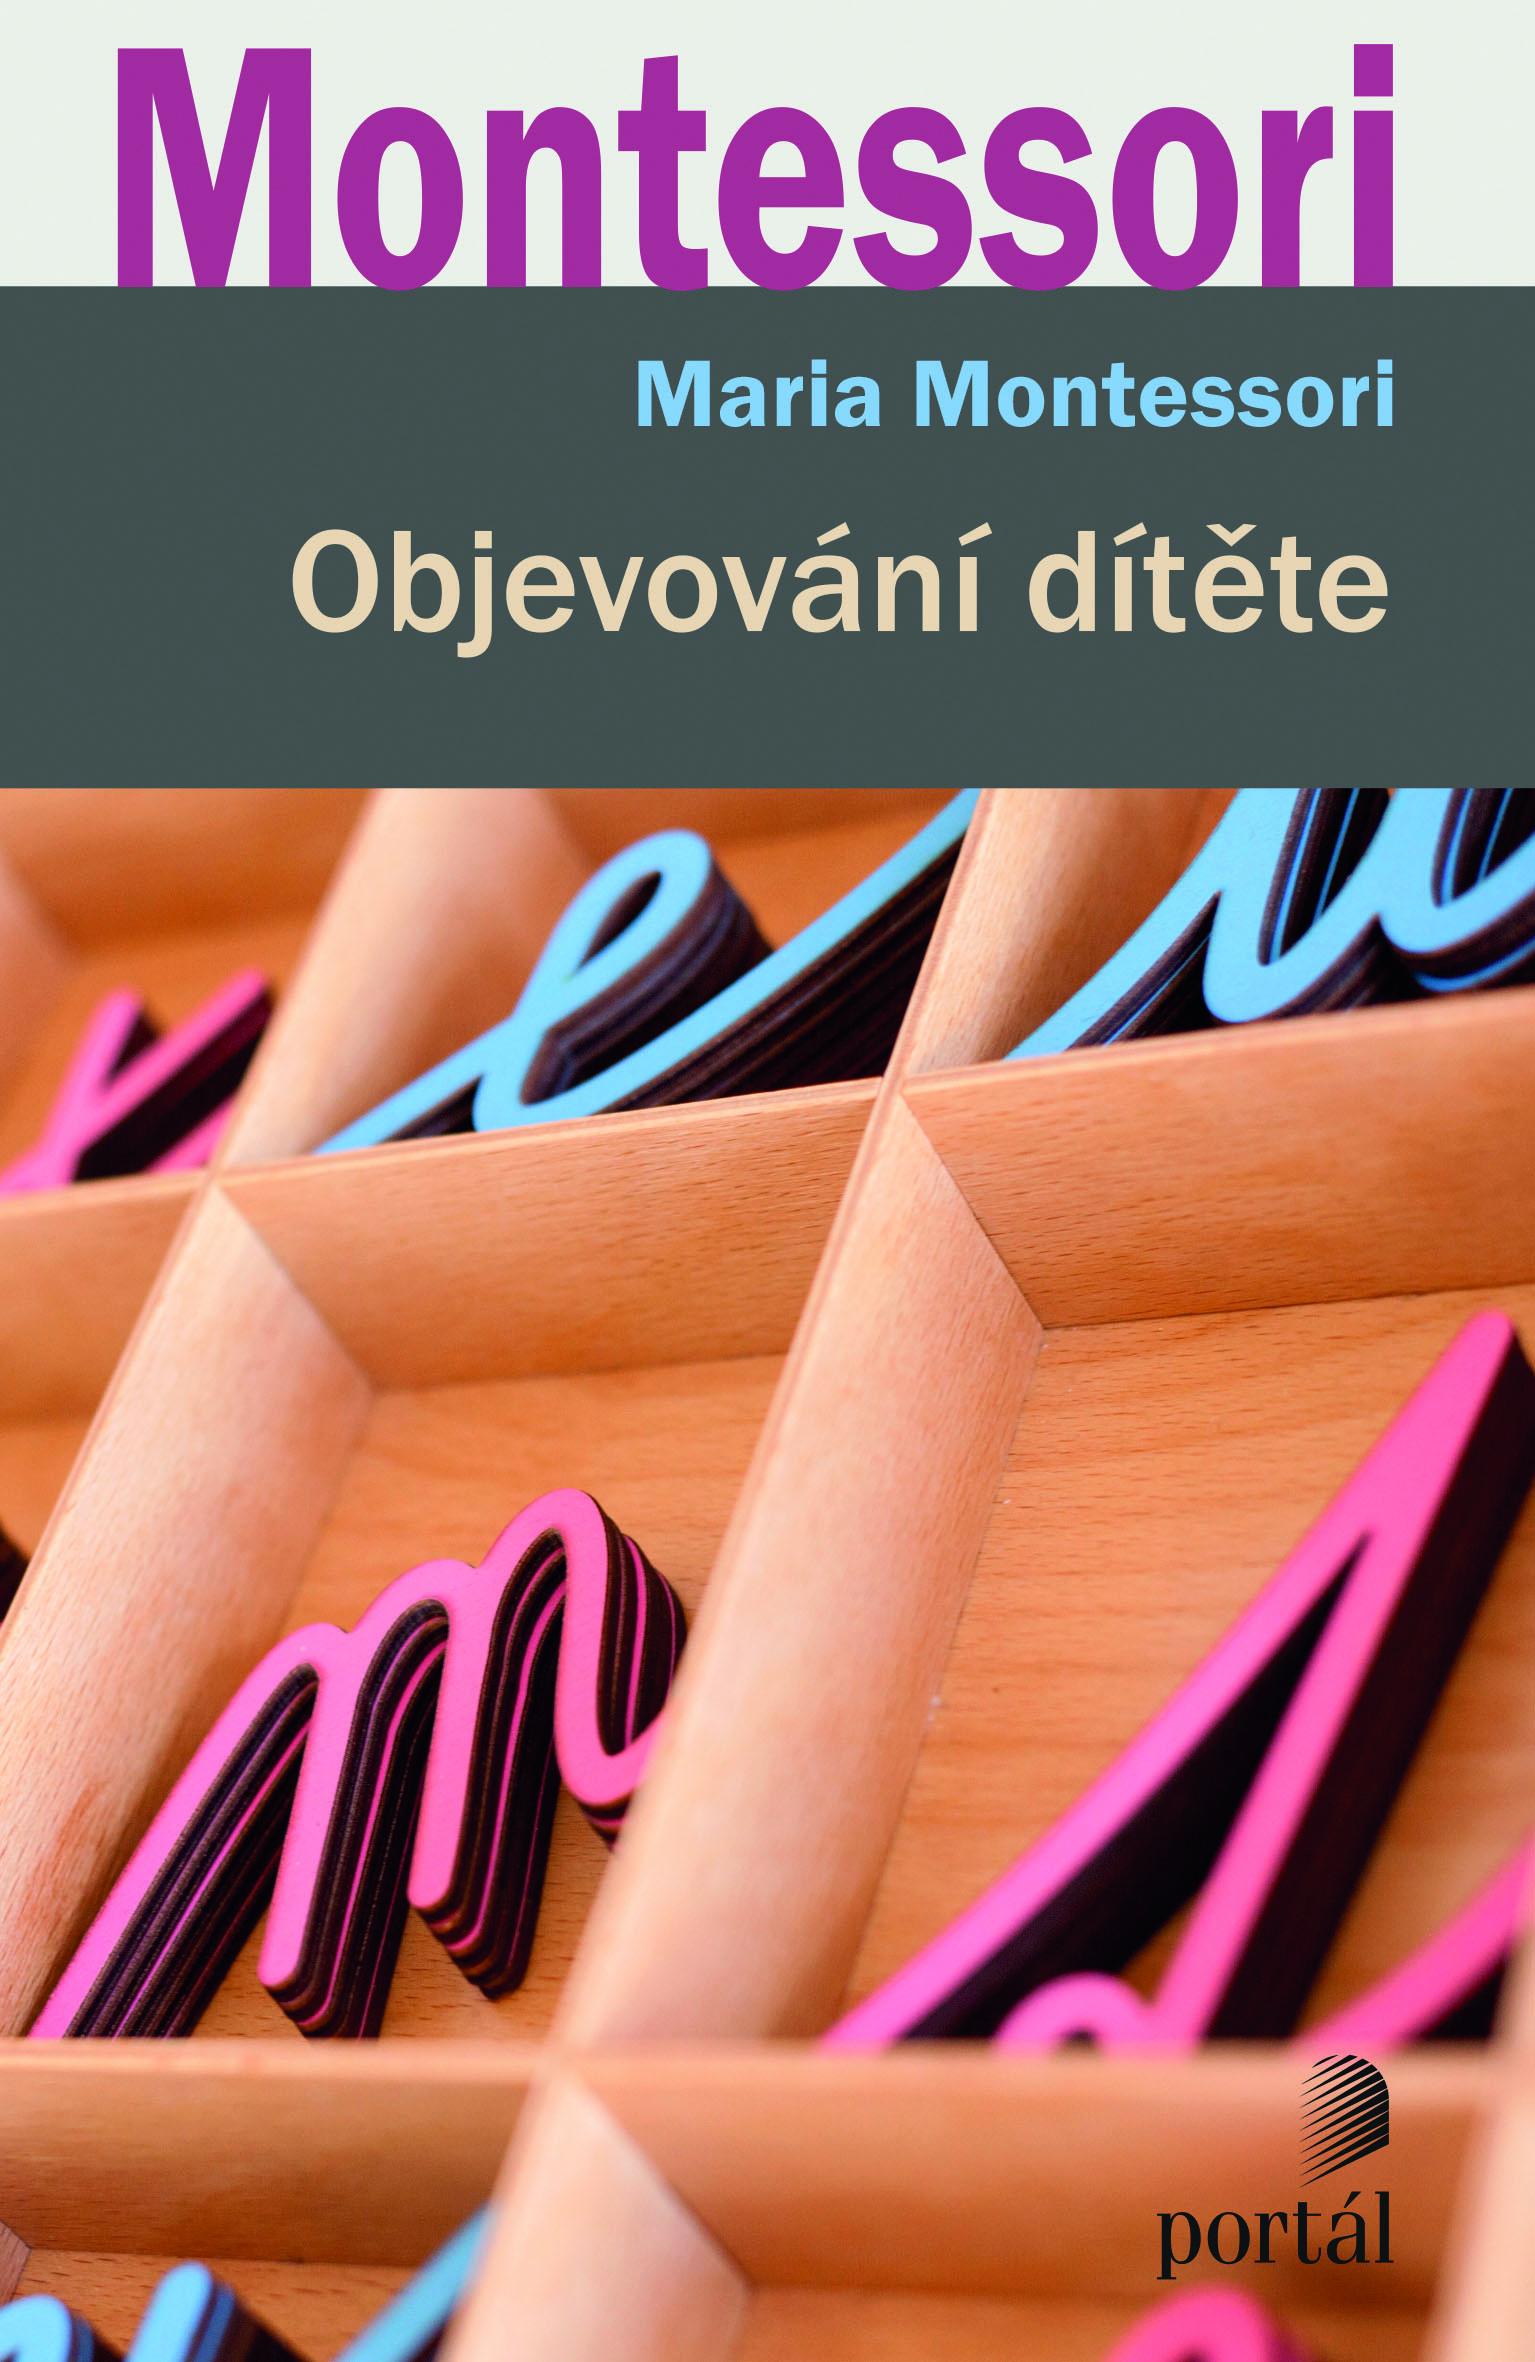 http://obchod.portal.cz/userdata/images/hires/9788026212348.jpg